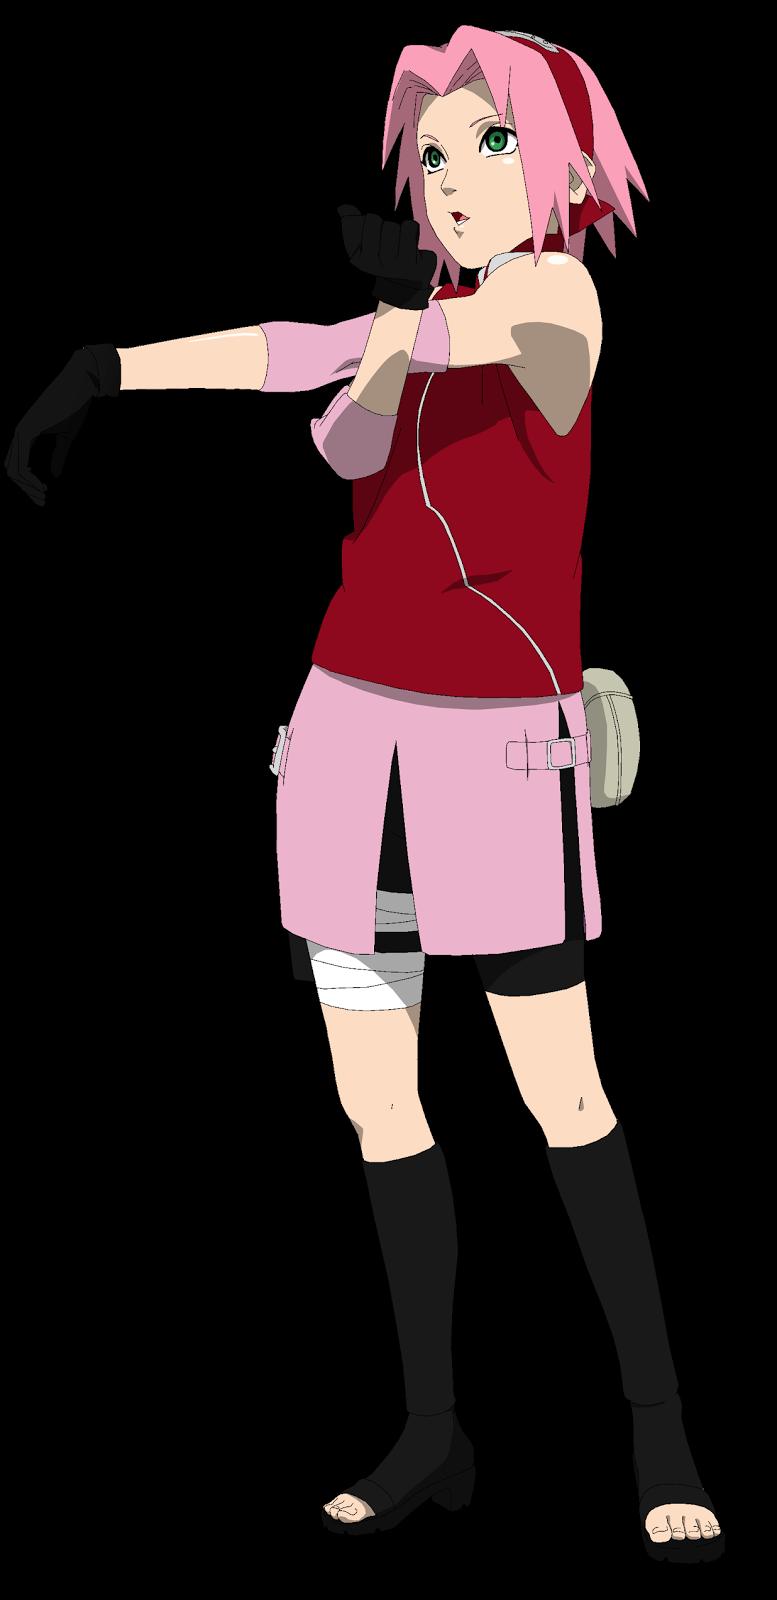 Animé imágenes by Akatsuki Karasu: 38 renders de Sakura